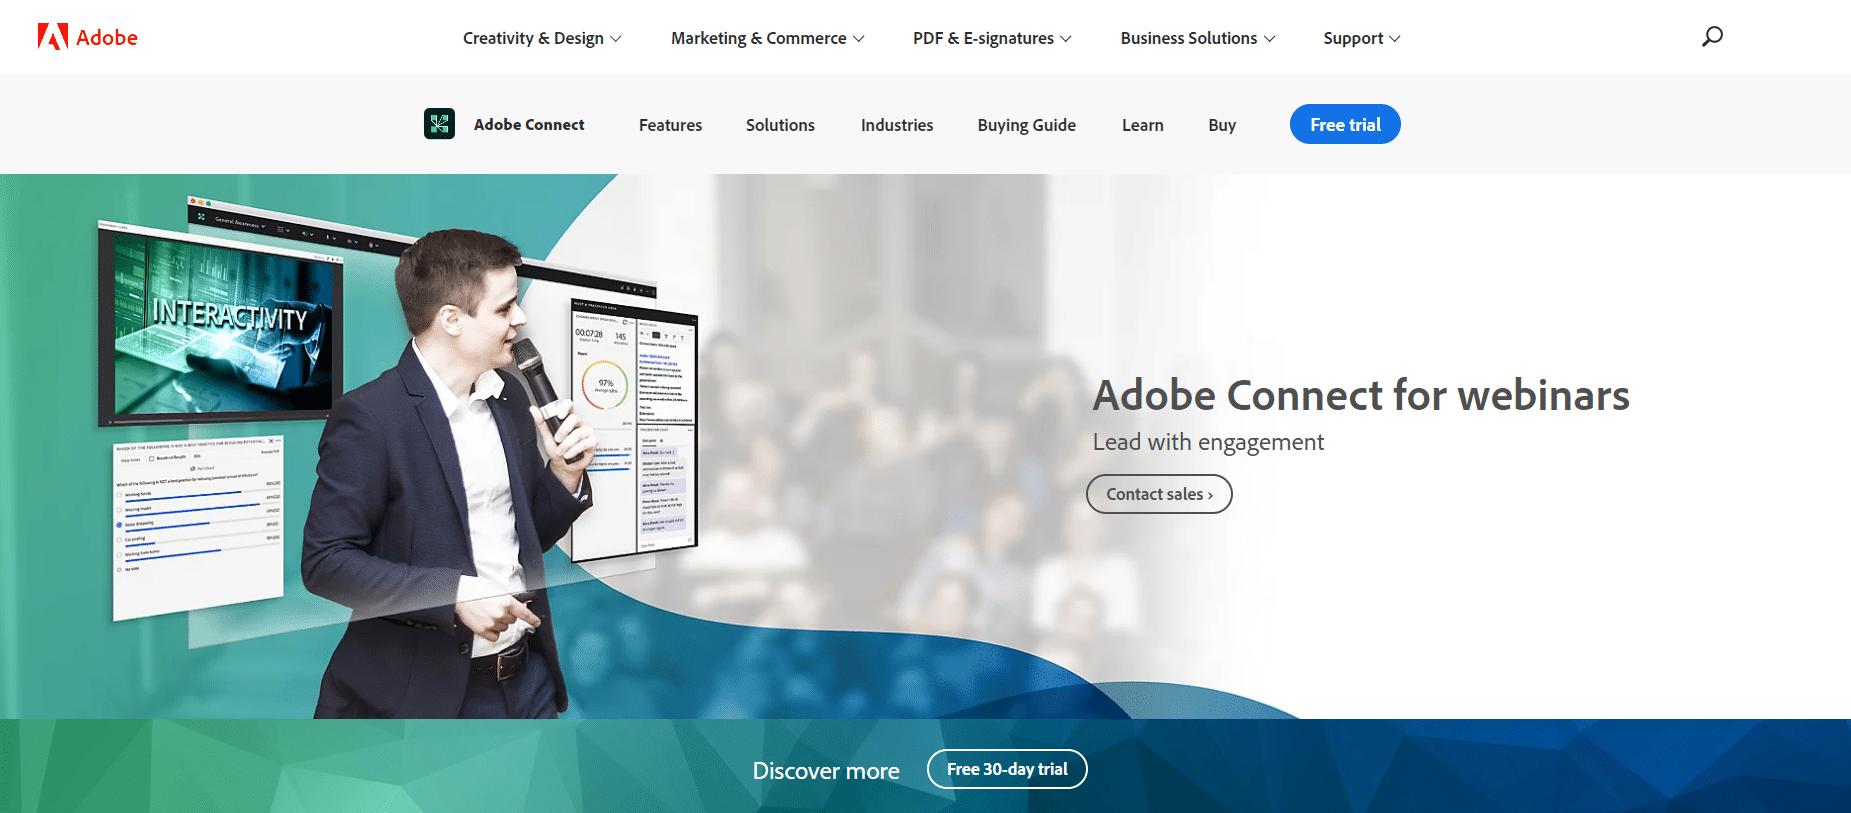 adobe-connect-for-webinars